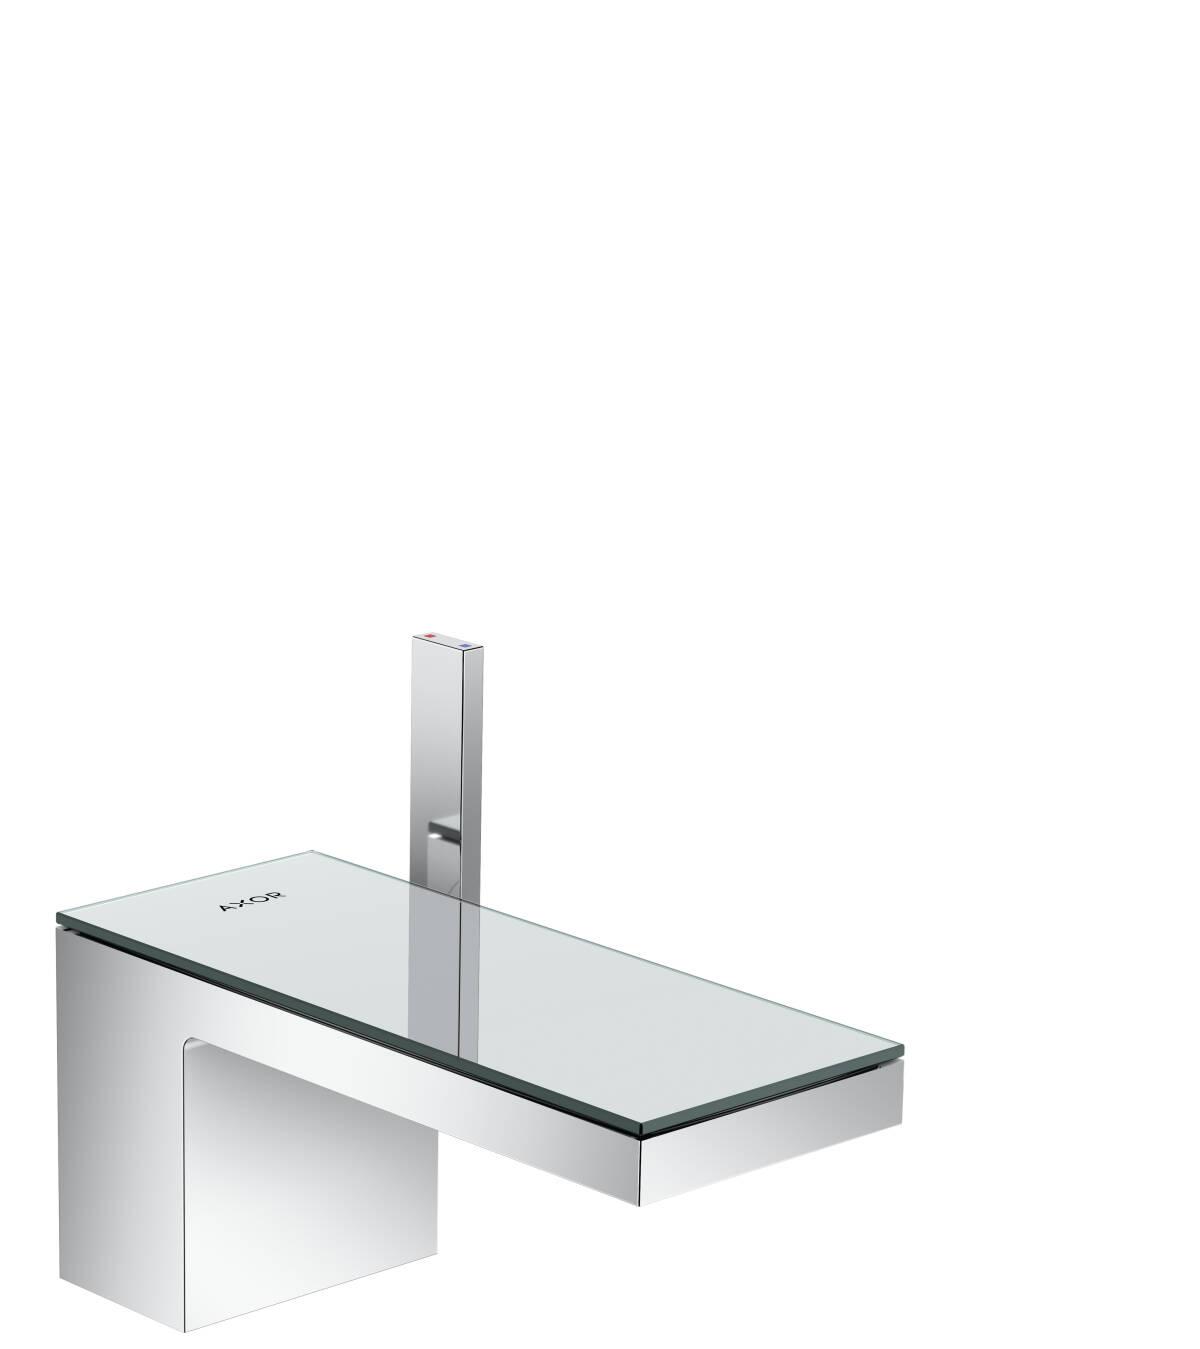 chrome / mirror glass, 47010000